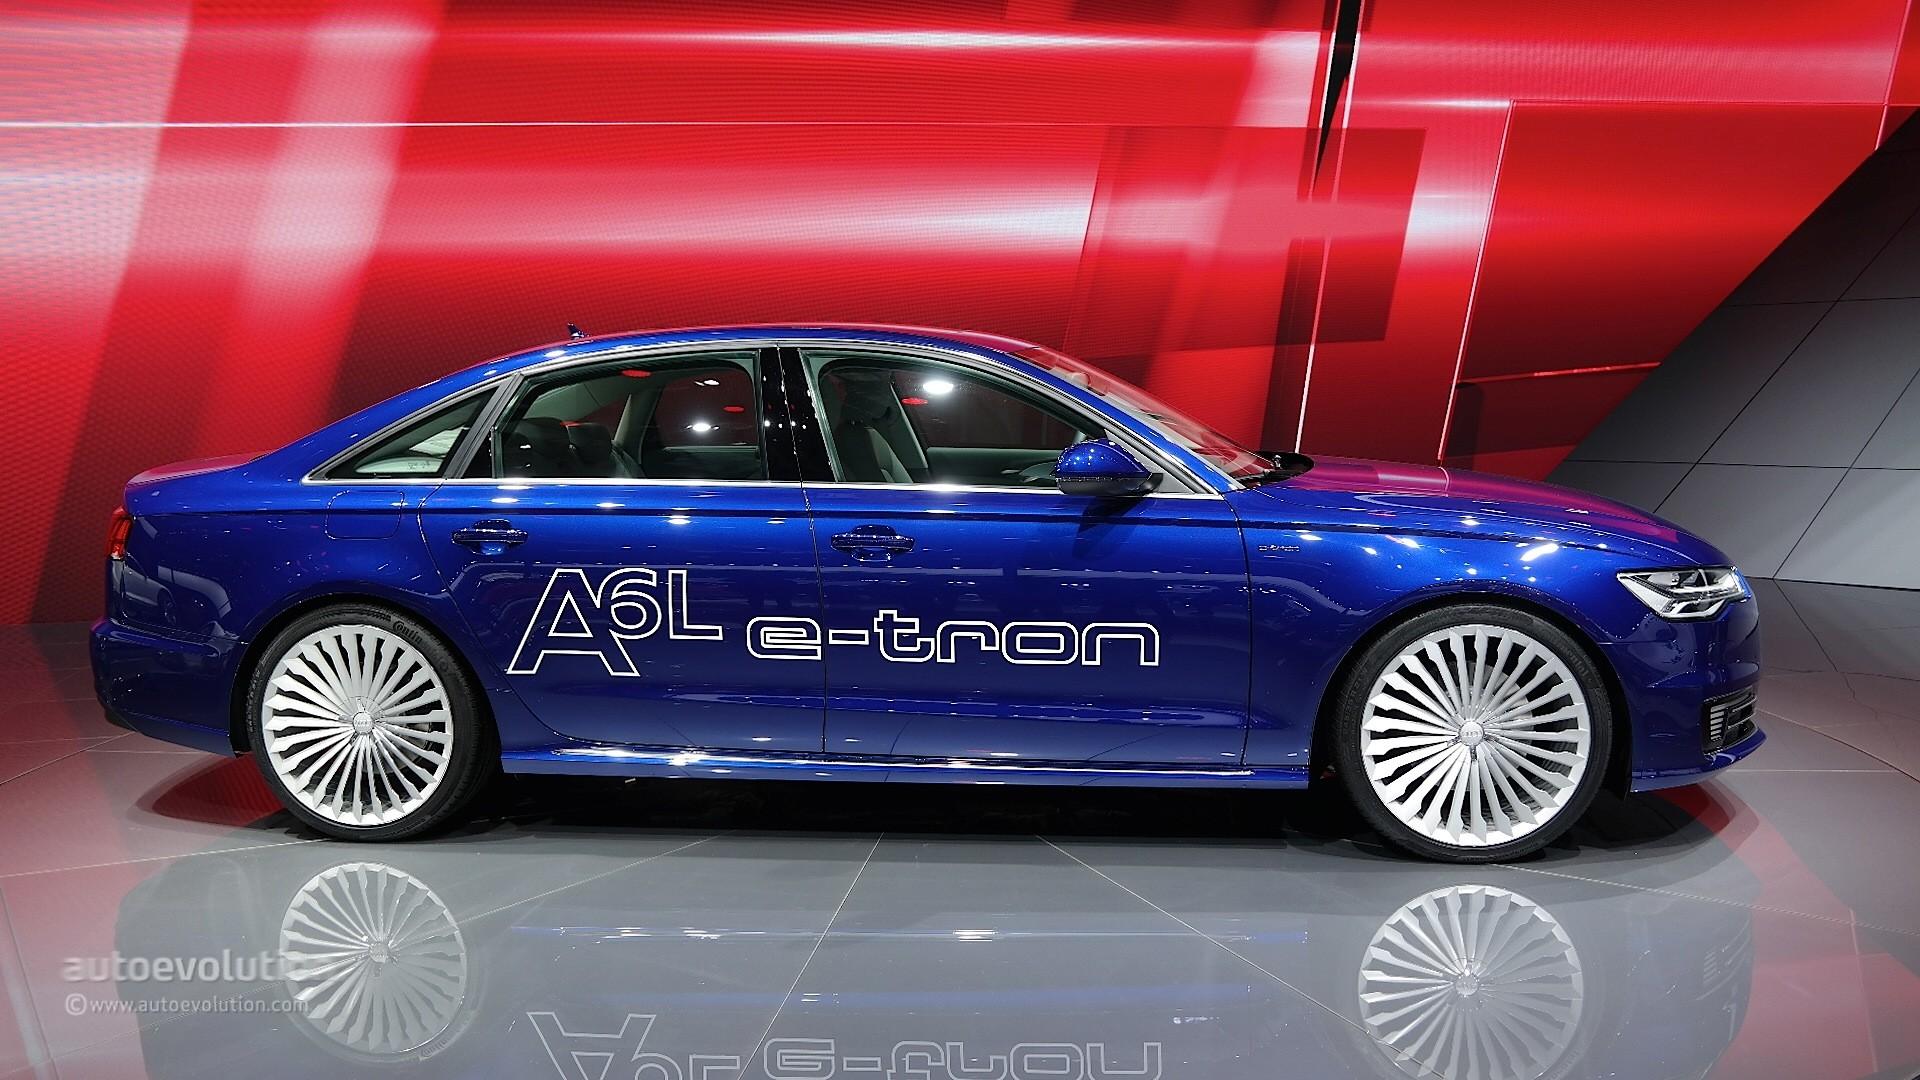 Audi A6 L e-tron Plug-in Hybrid Debuts at Auto Shanghai ...